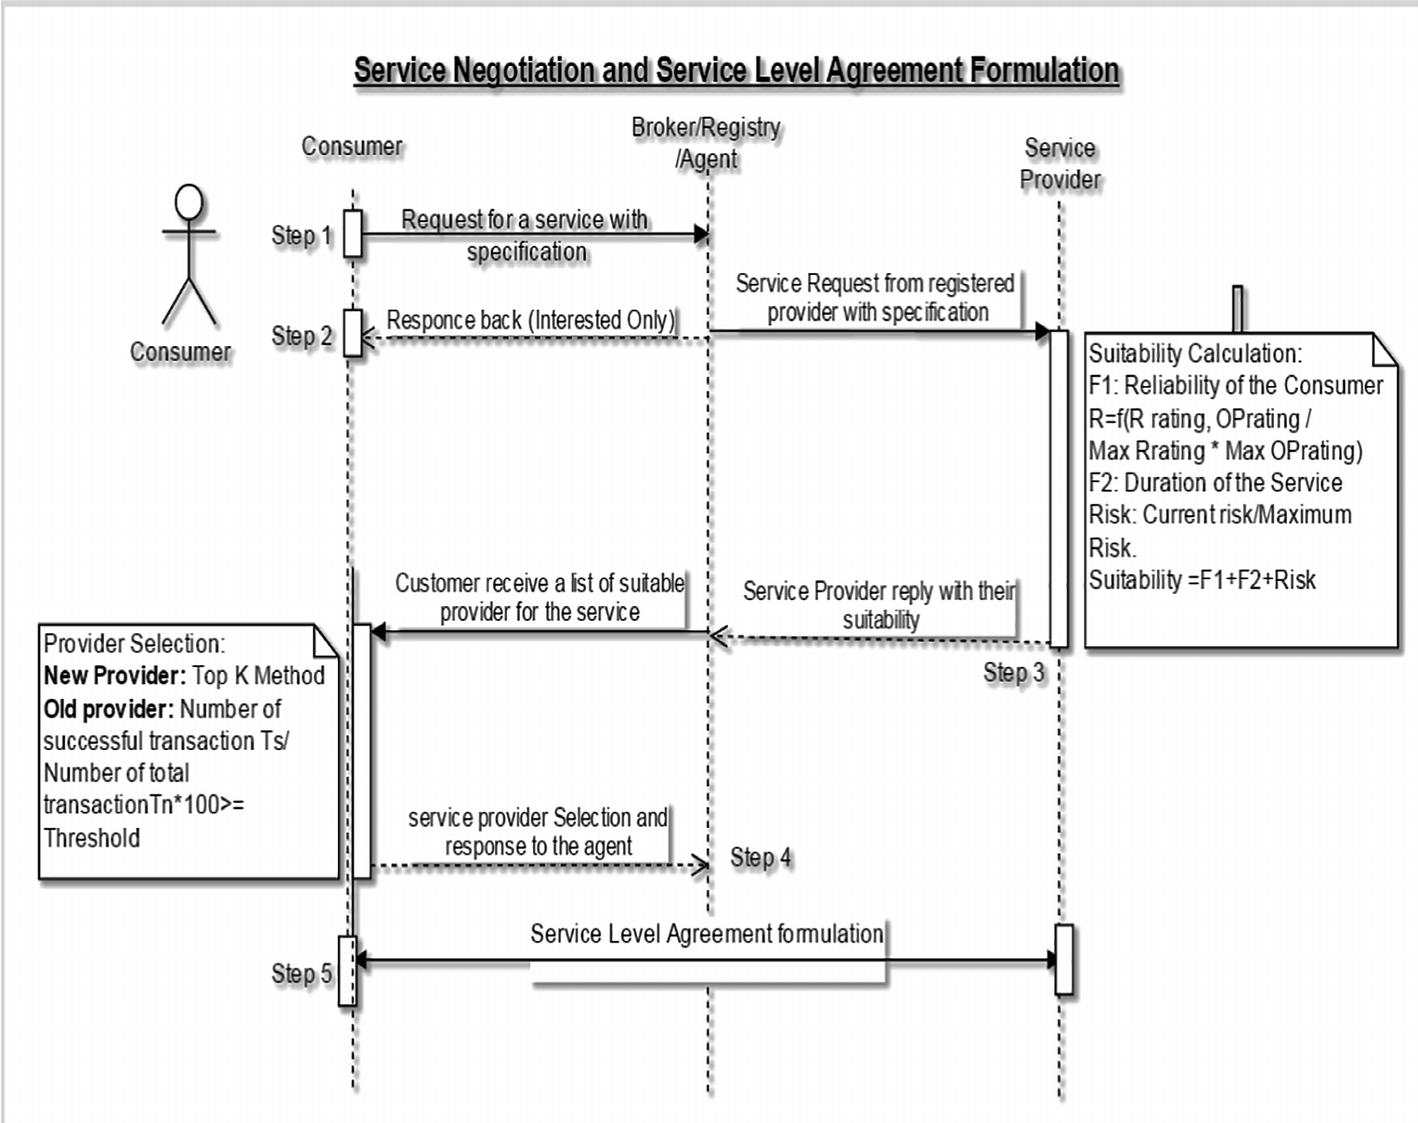 A SOA Based SLA Negotiation and Formulation Architecture for